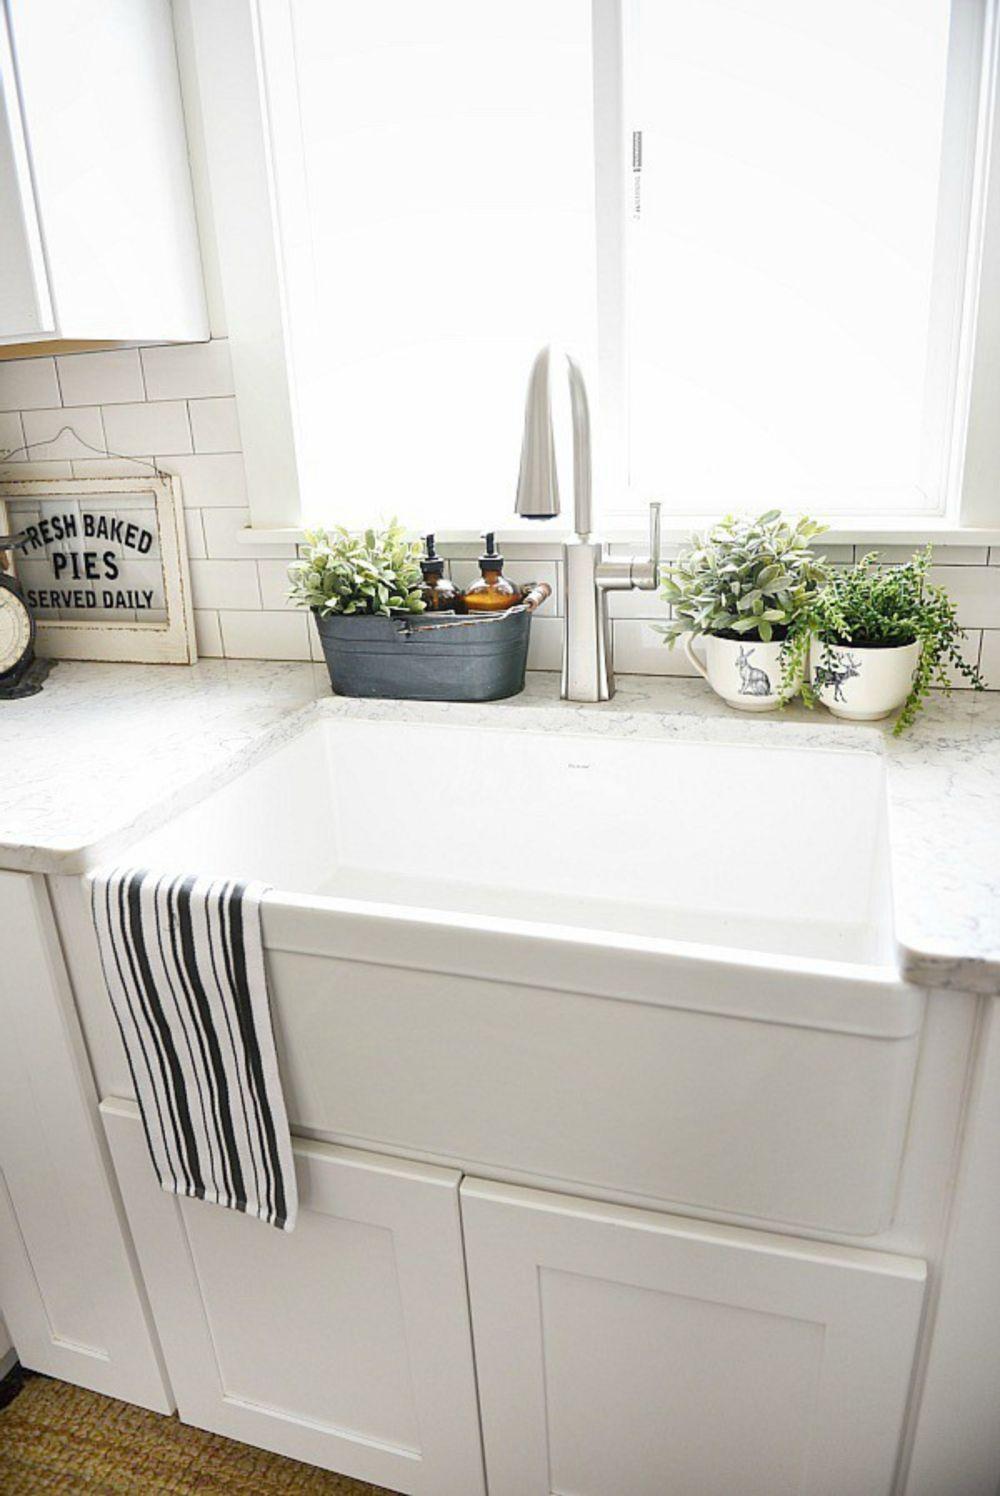 Beautiful diy farmhouse kitchen ideas that make it